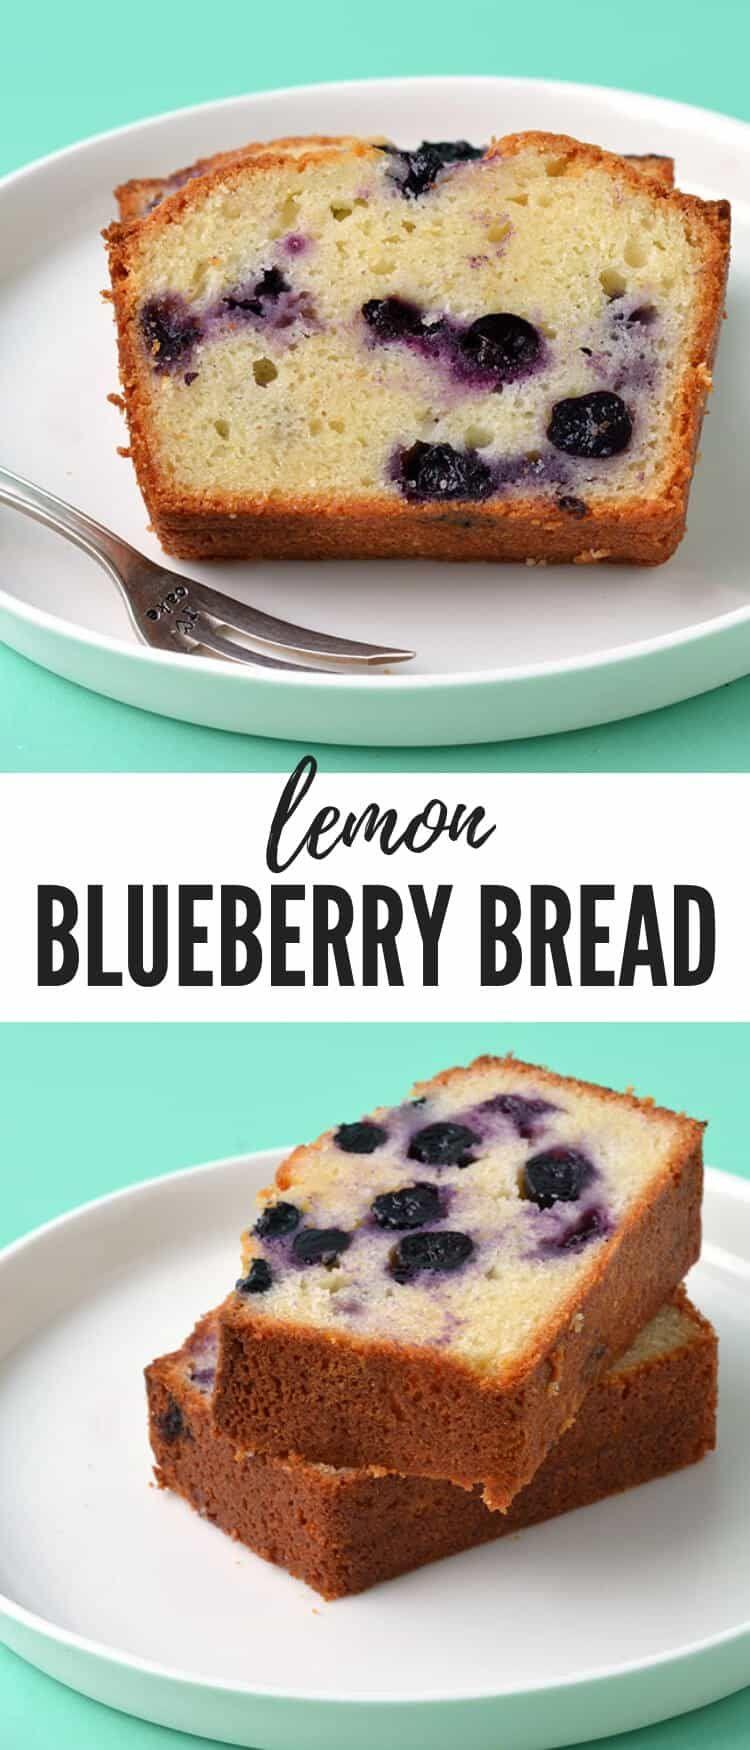 Blueberry Bread | Recipe | Blueberry bread, Tea recipes ...